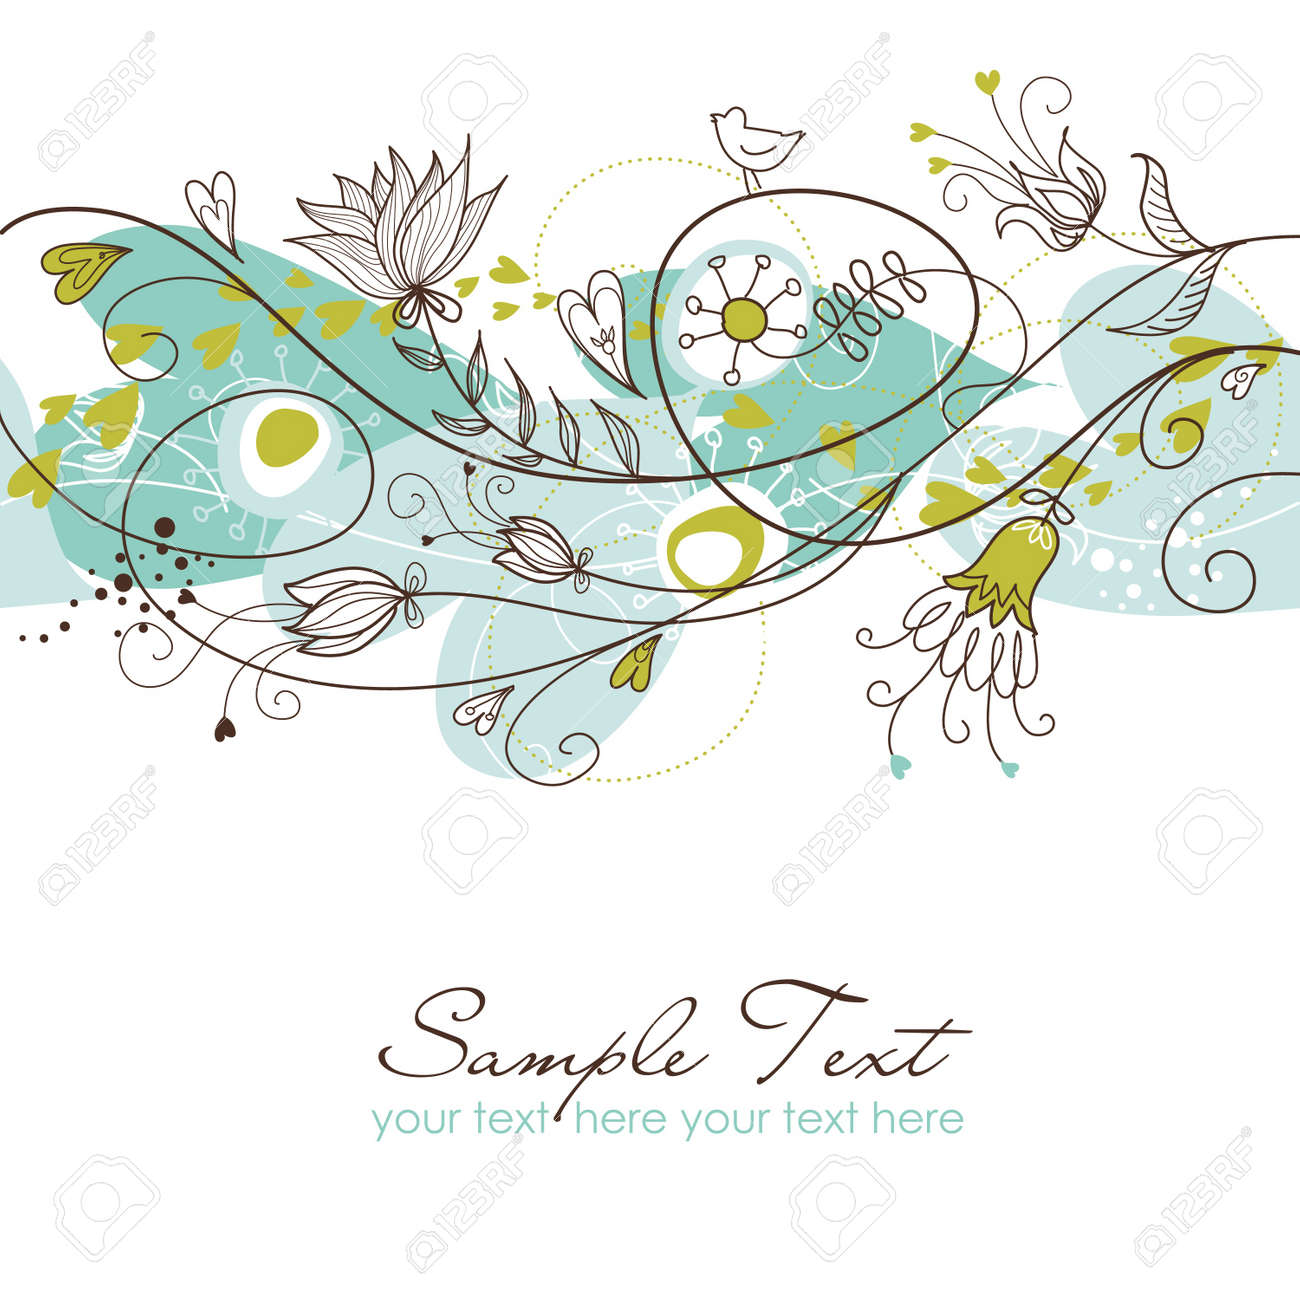 Retro floral seamless background - 10937494